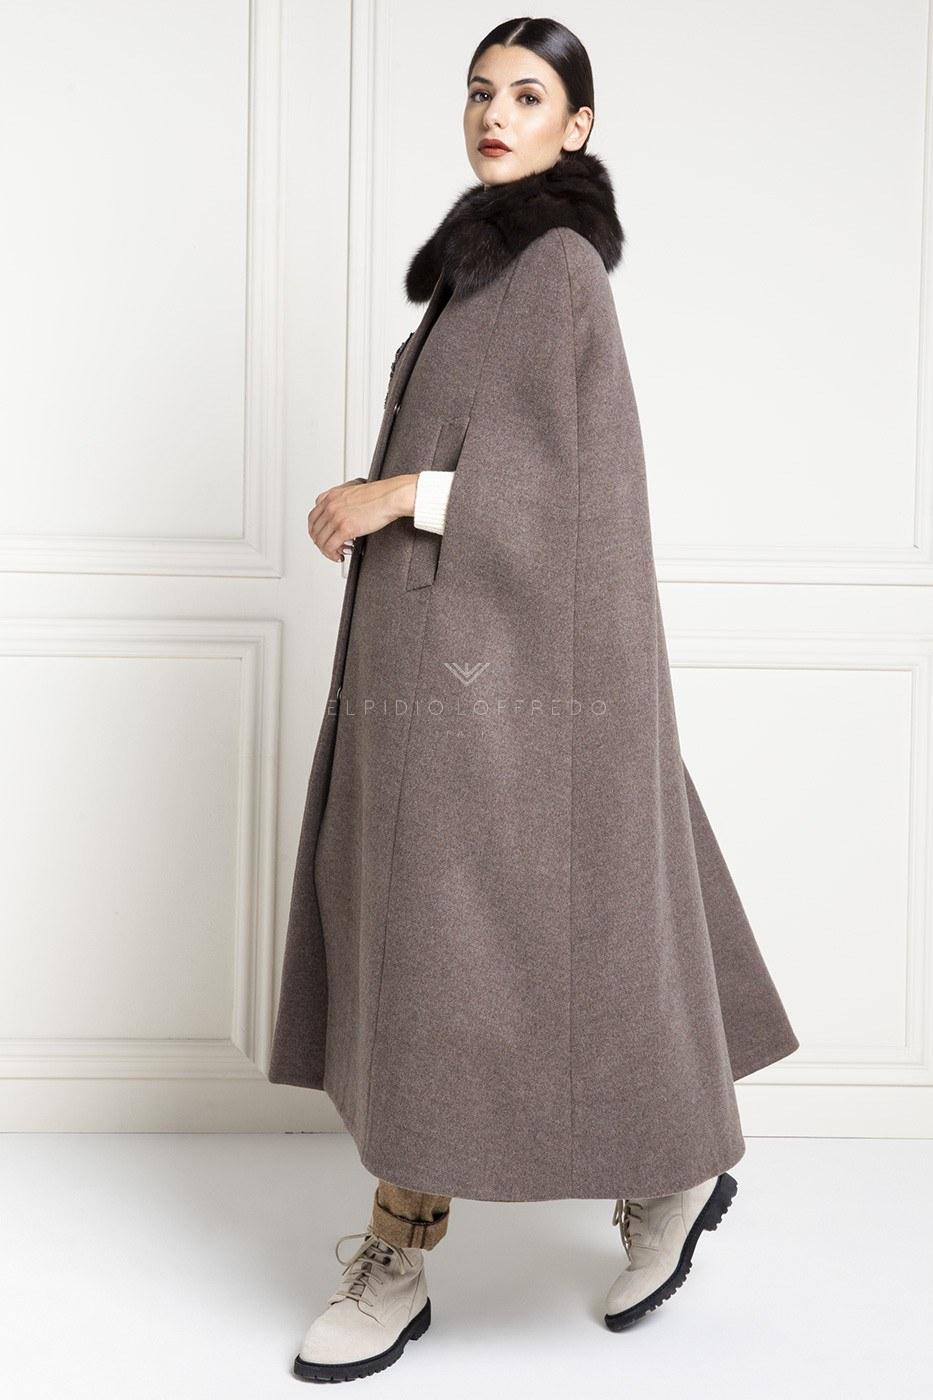 Cashmere Loro Piana Capes with Barguzinsky Russian Sable Fur - Length 130 cm